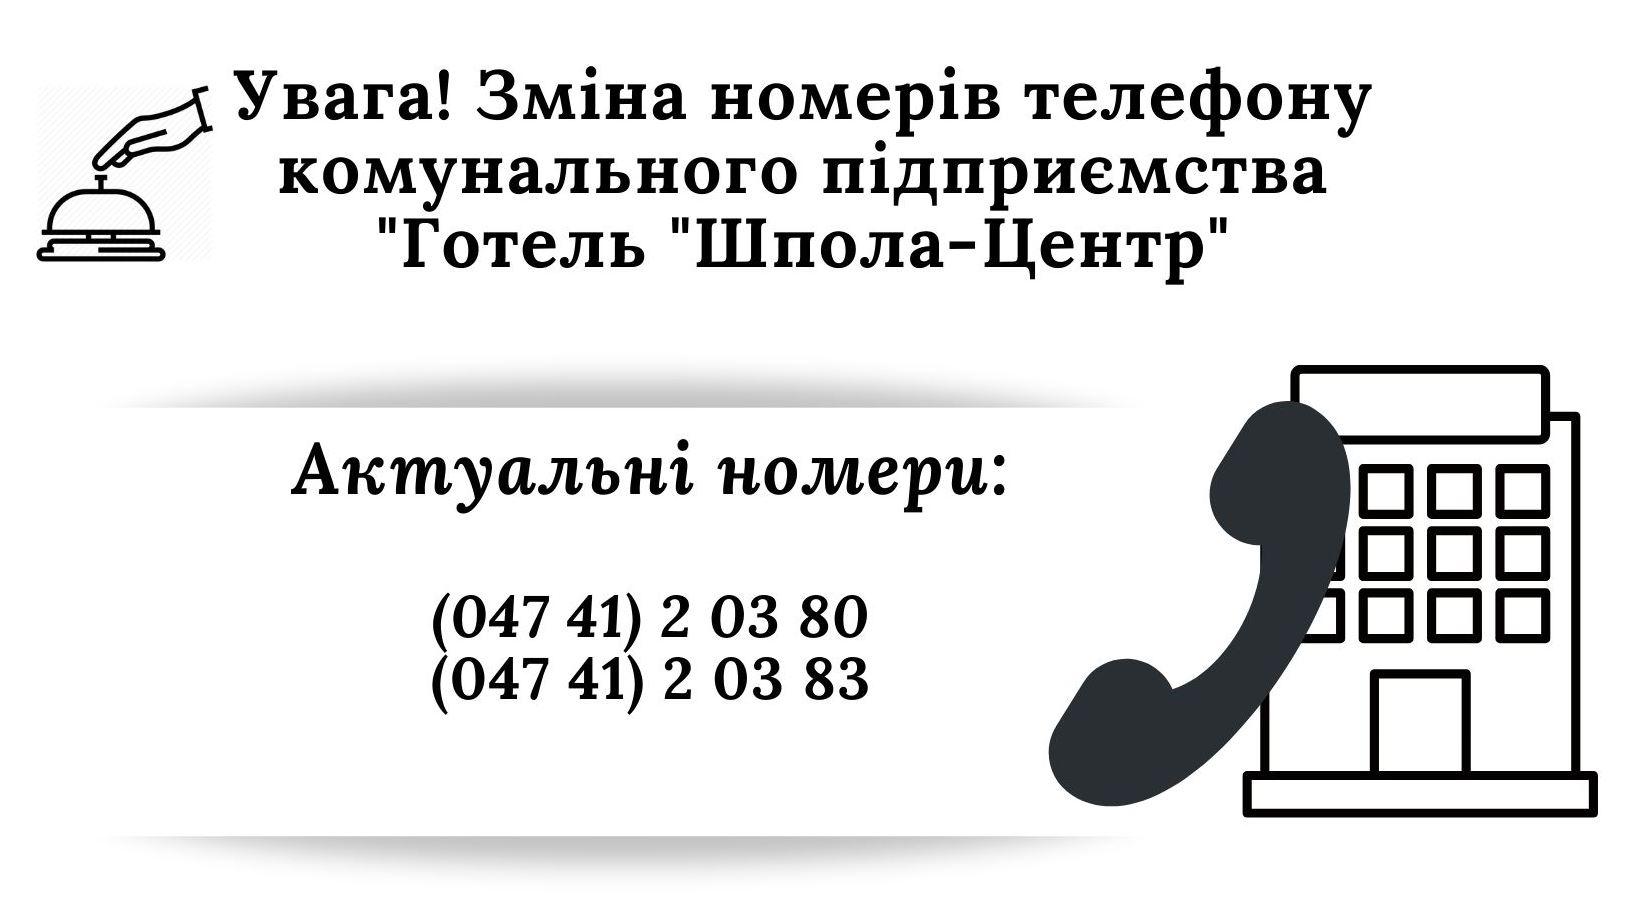 "Увага! Змінено номери телефону КП ""Готель Шпола-Центр"""